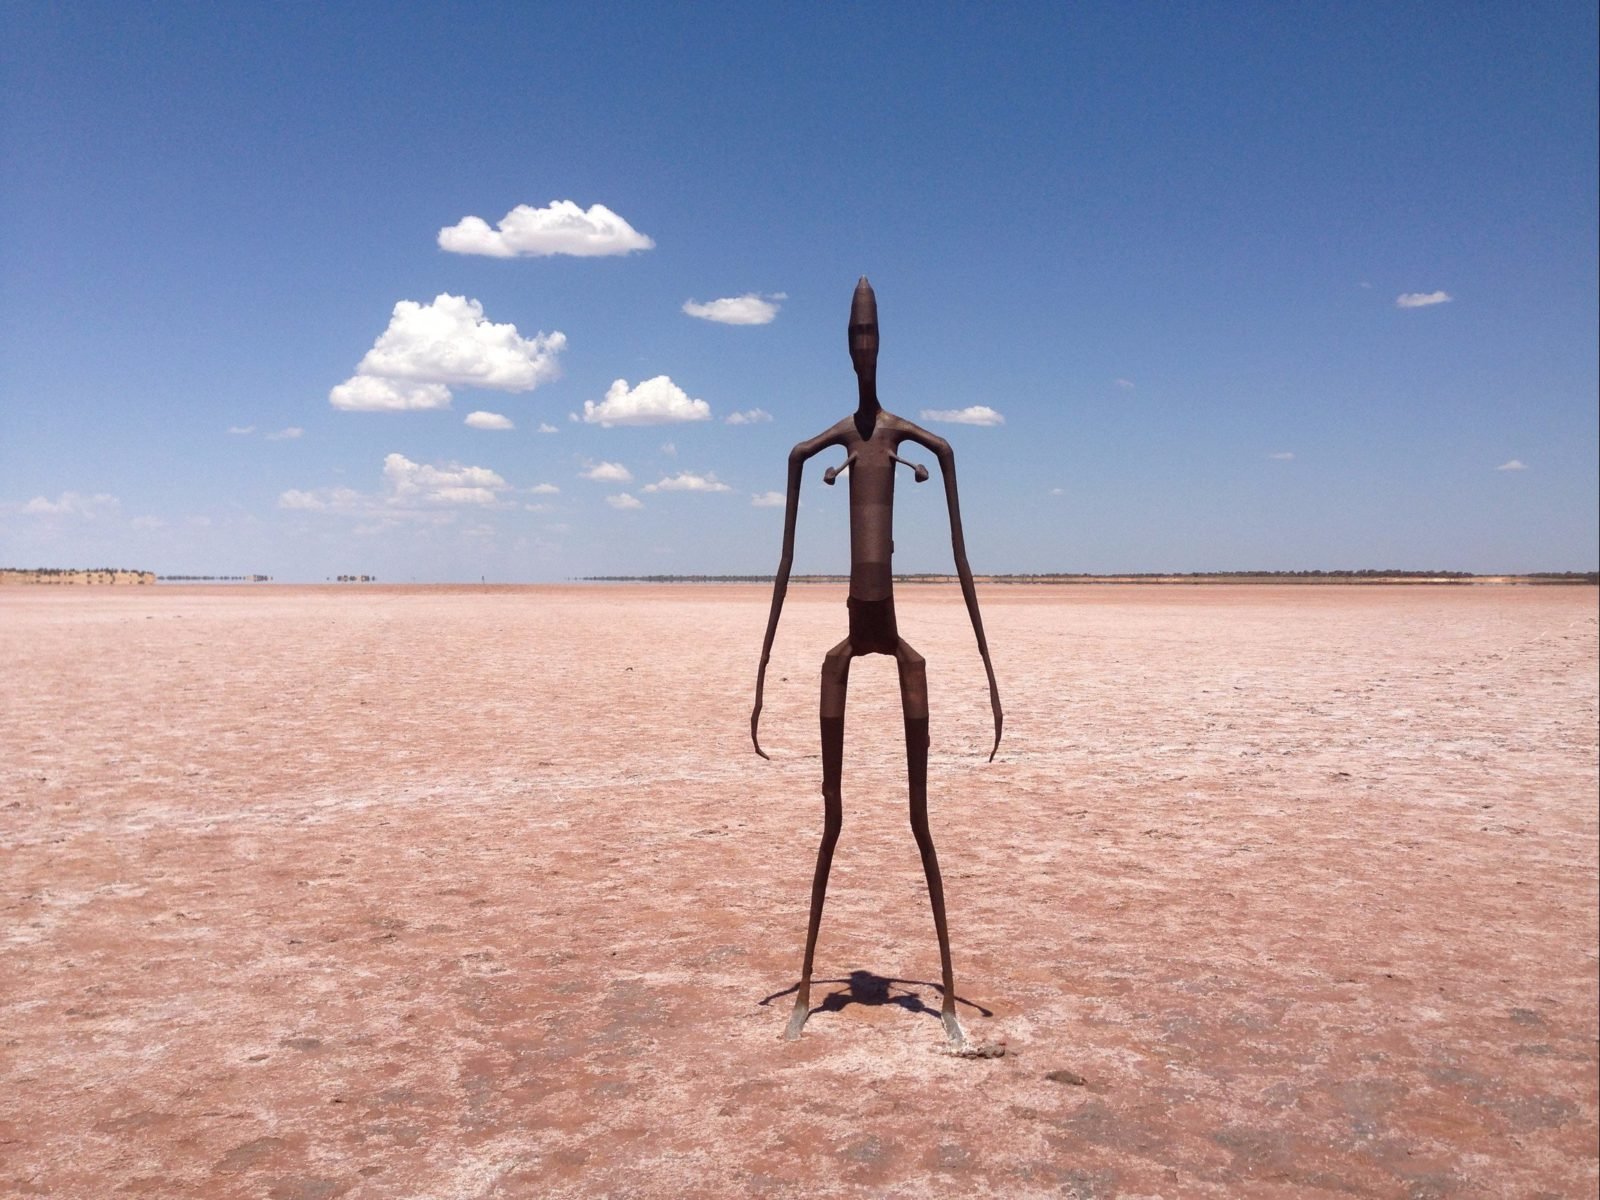 Antony Gormley Sculptures at Lake Ballard, Western Australia